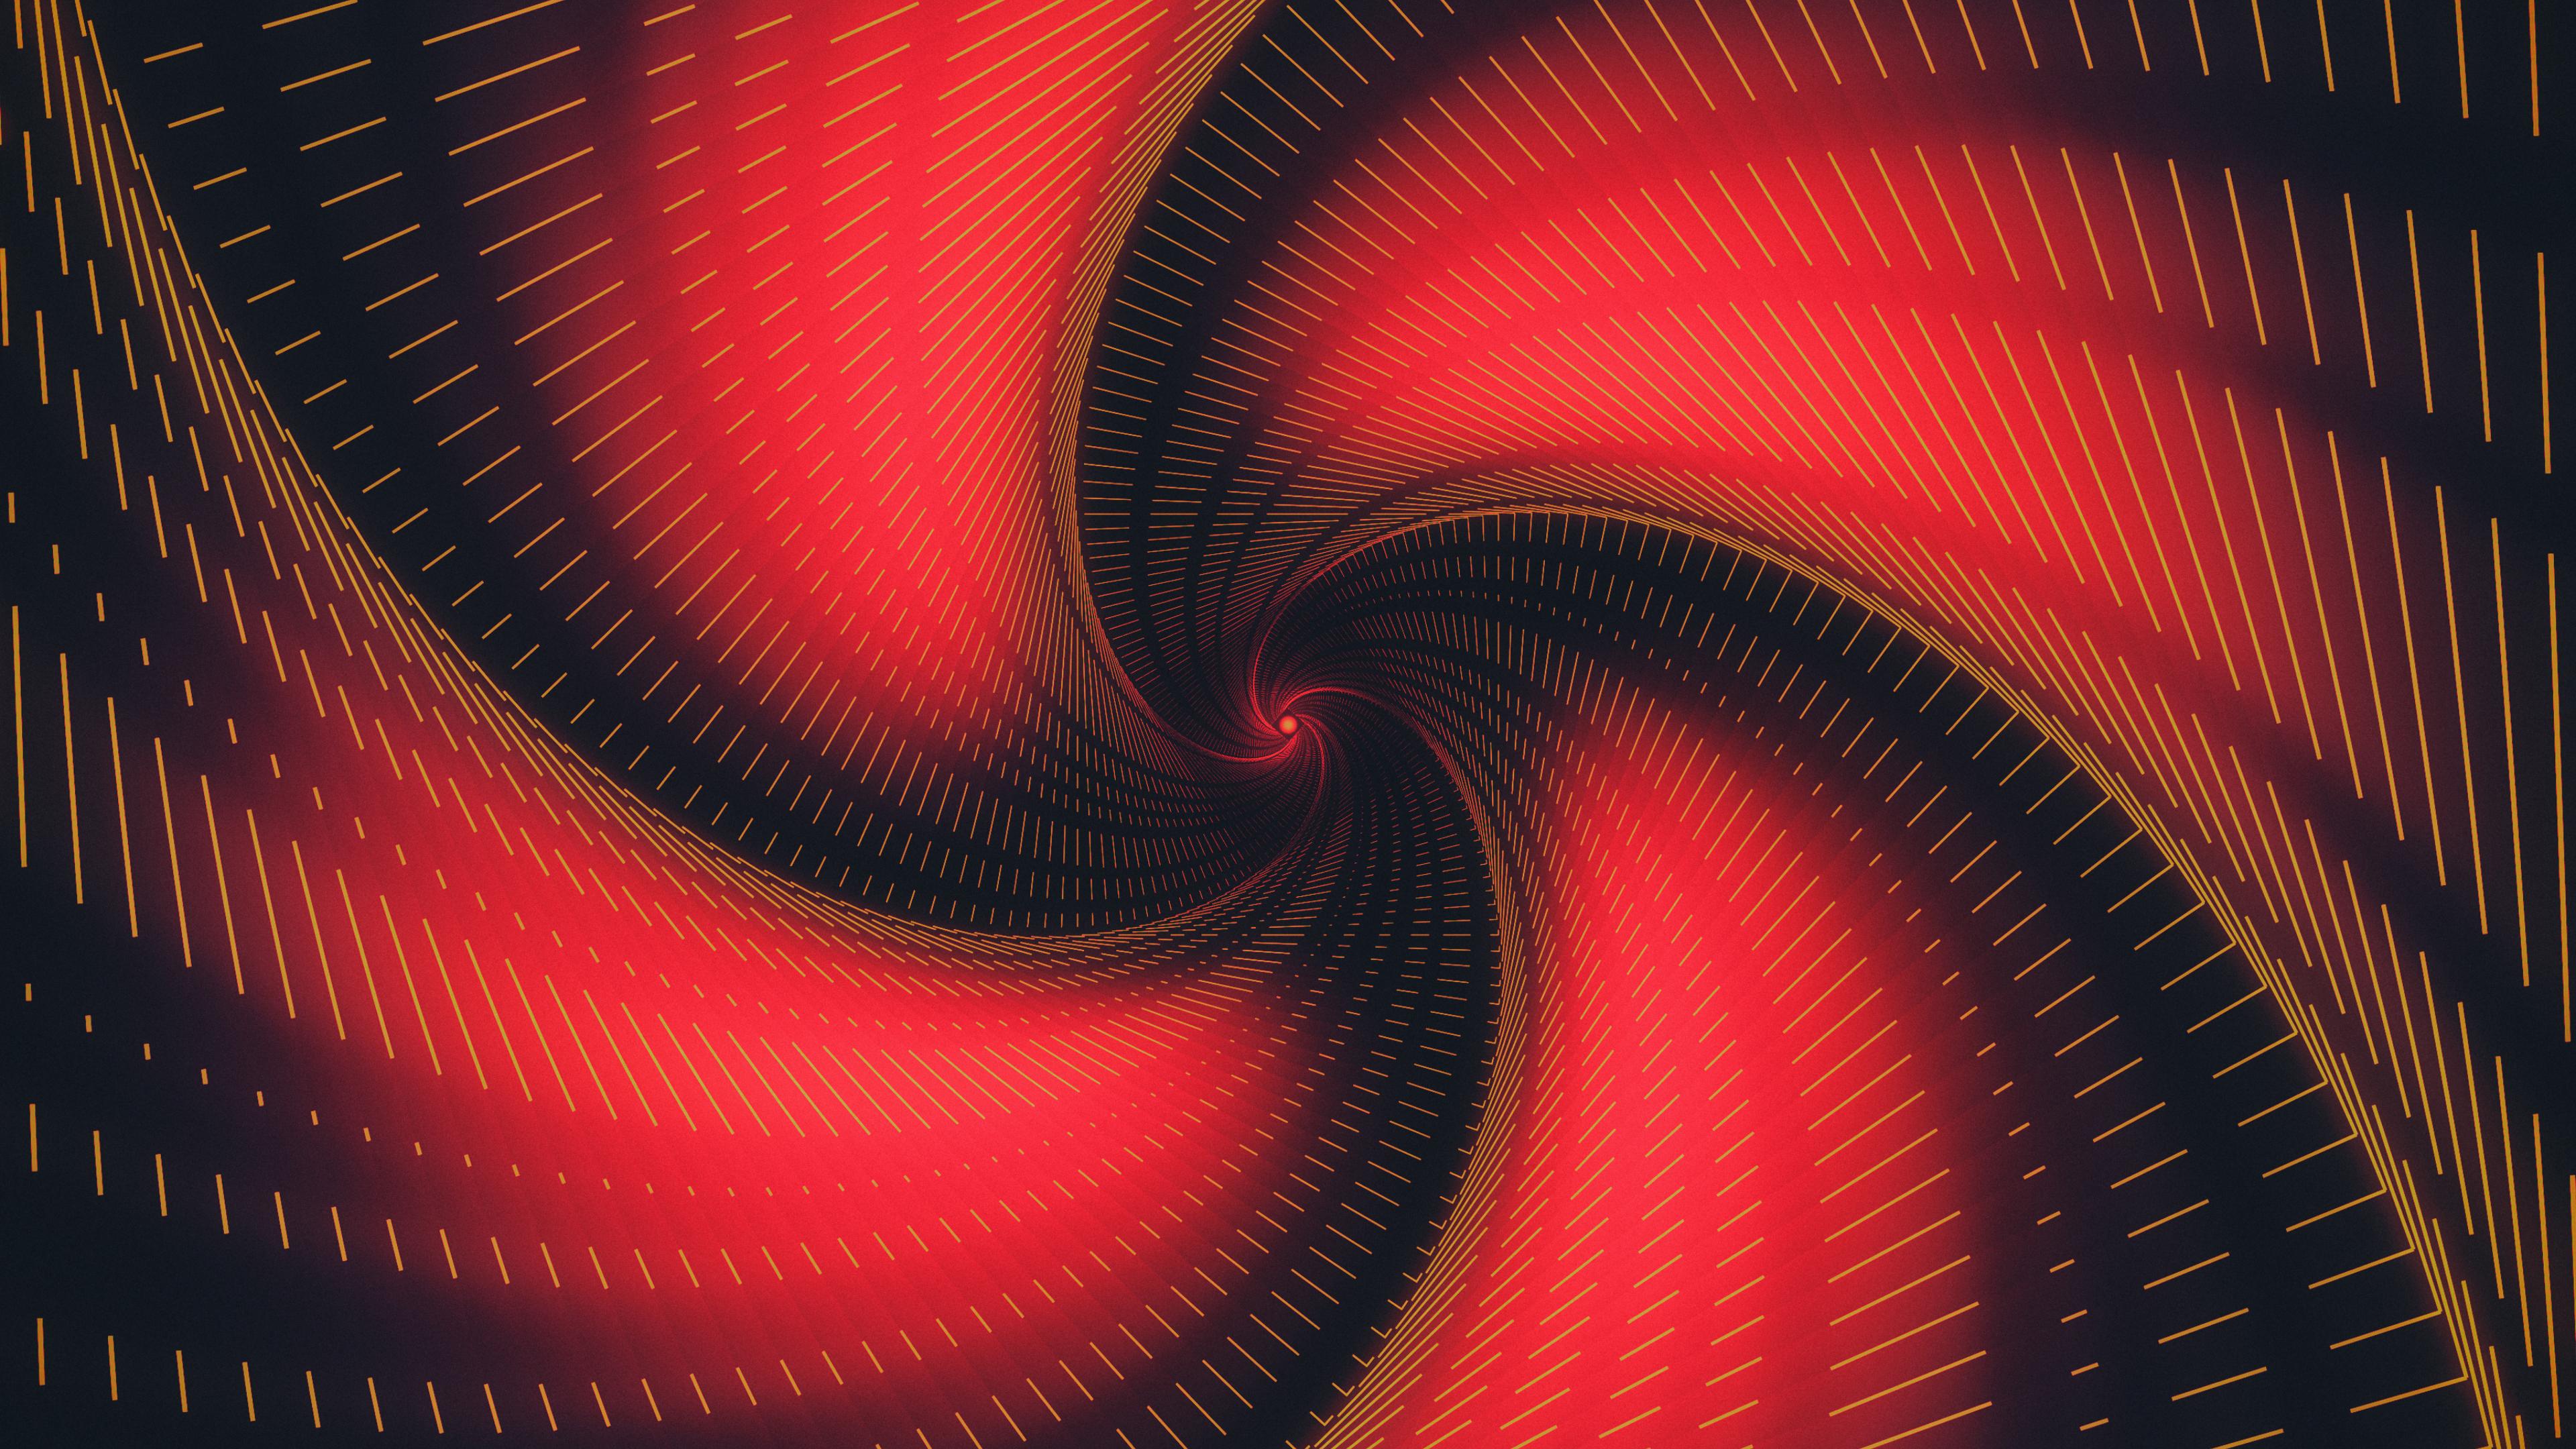 General 3840x2160 abstract swirl digital art red black lines Erich Randall